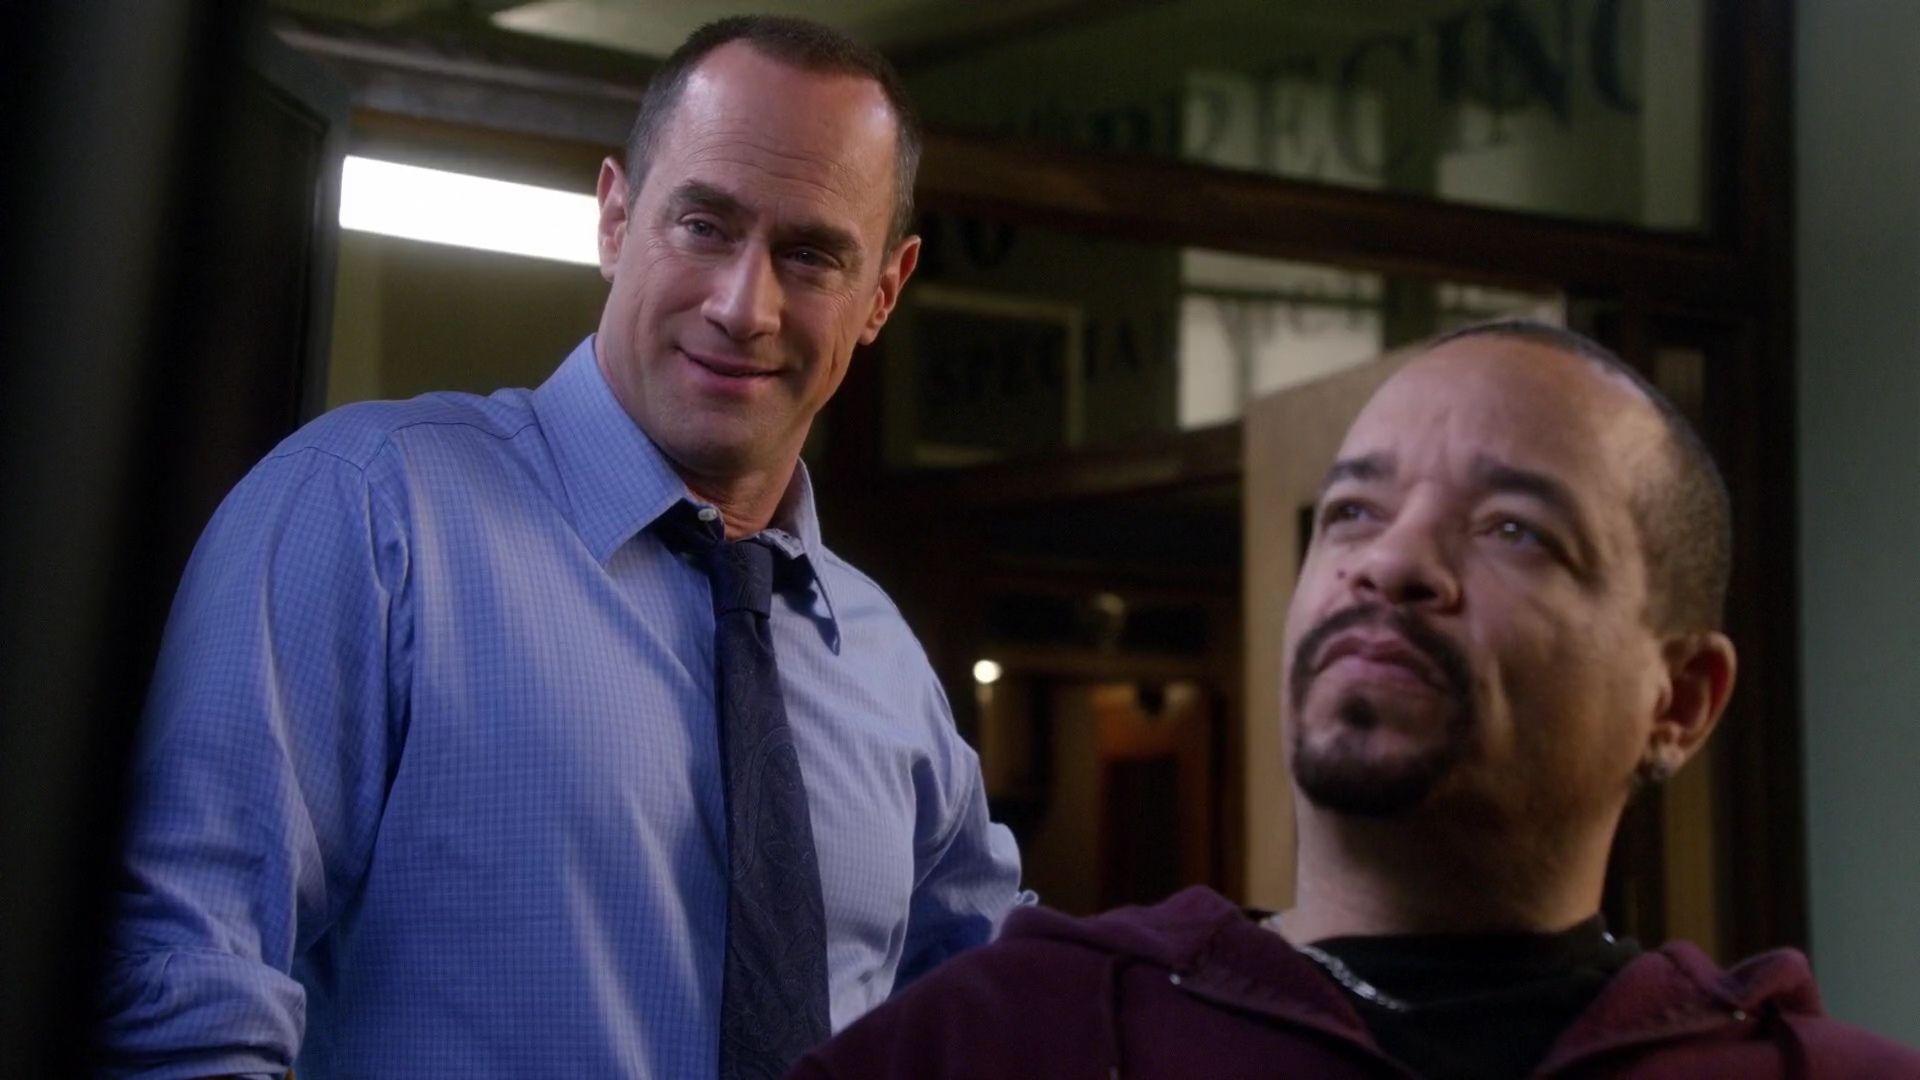 Detectives Elliot Stabler Fin Tutuola Season Twelve Law And Order Svu Special Victims Unit Chris Meloni